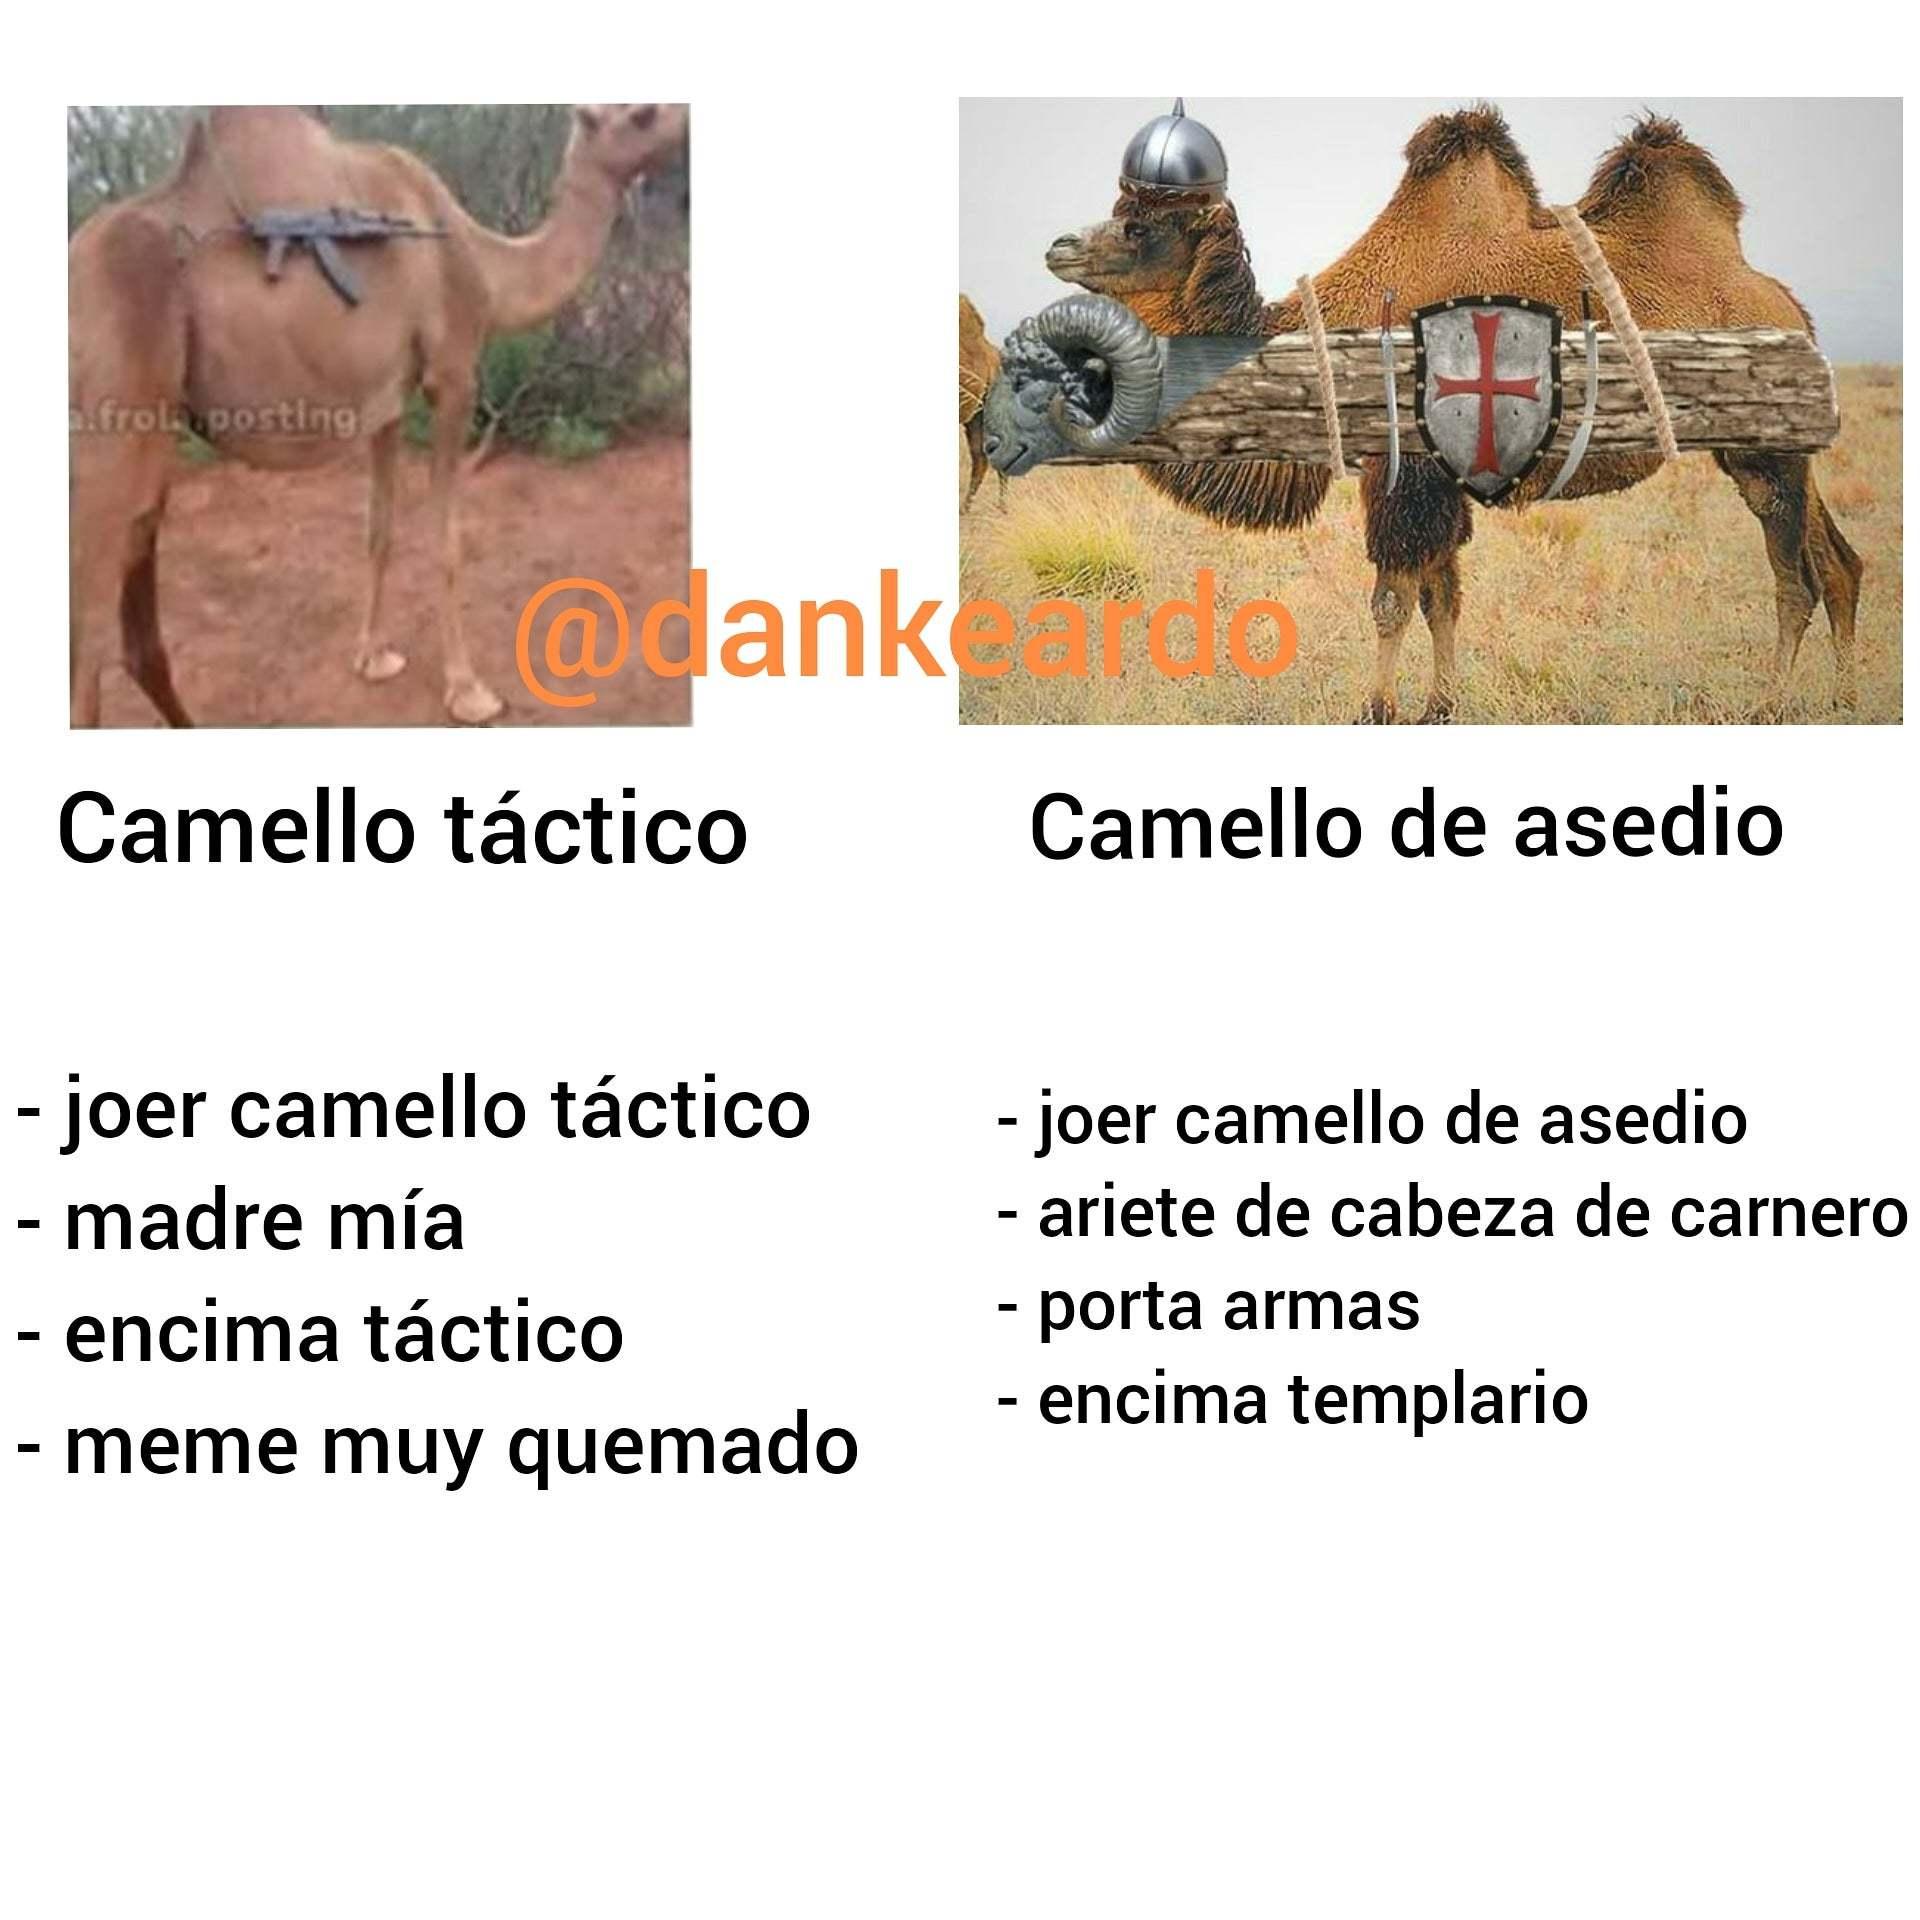 Encima templario - meme